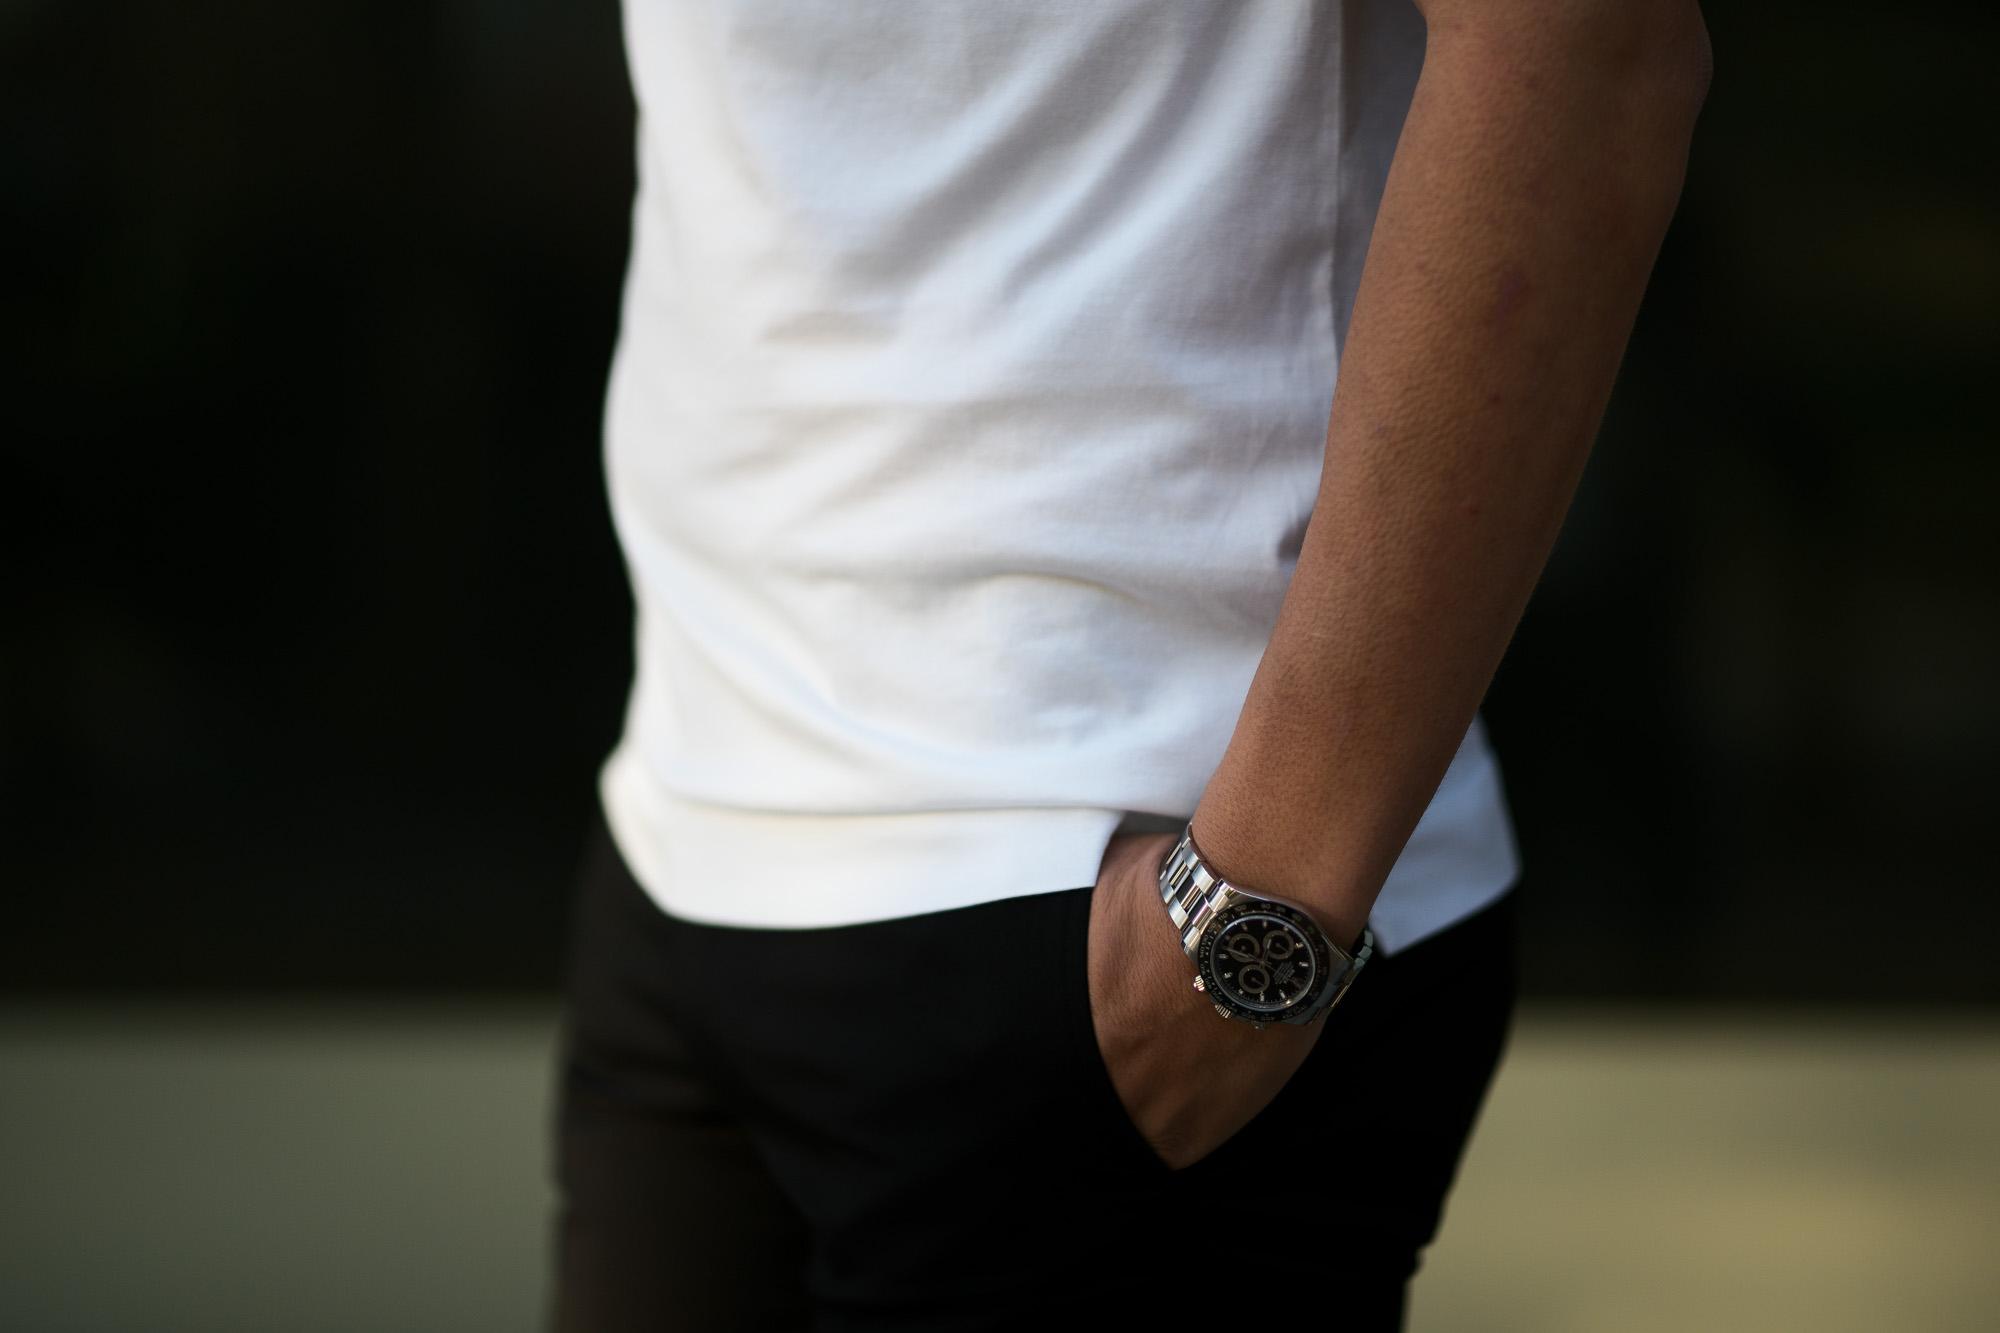 FEDELI(フェデーリ) Crew Neck T-shirt (クルーネック Tシャツ) ギザコットン Tシャツ WHITE (ホワイト・41) made in italy (イタリア製) 2020 春夏 【ご予約受付中】 愛知 名古屋 altoediritto アルトエデリット TEE